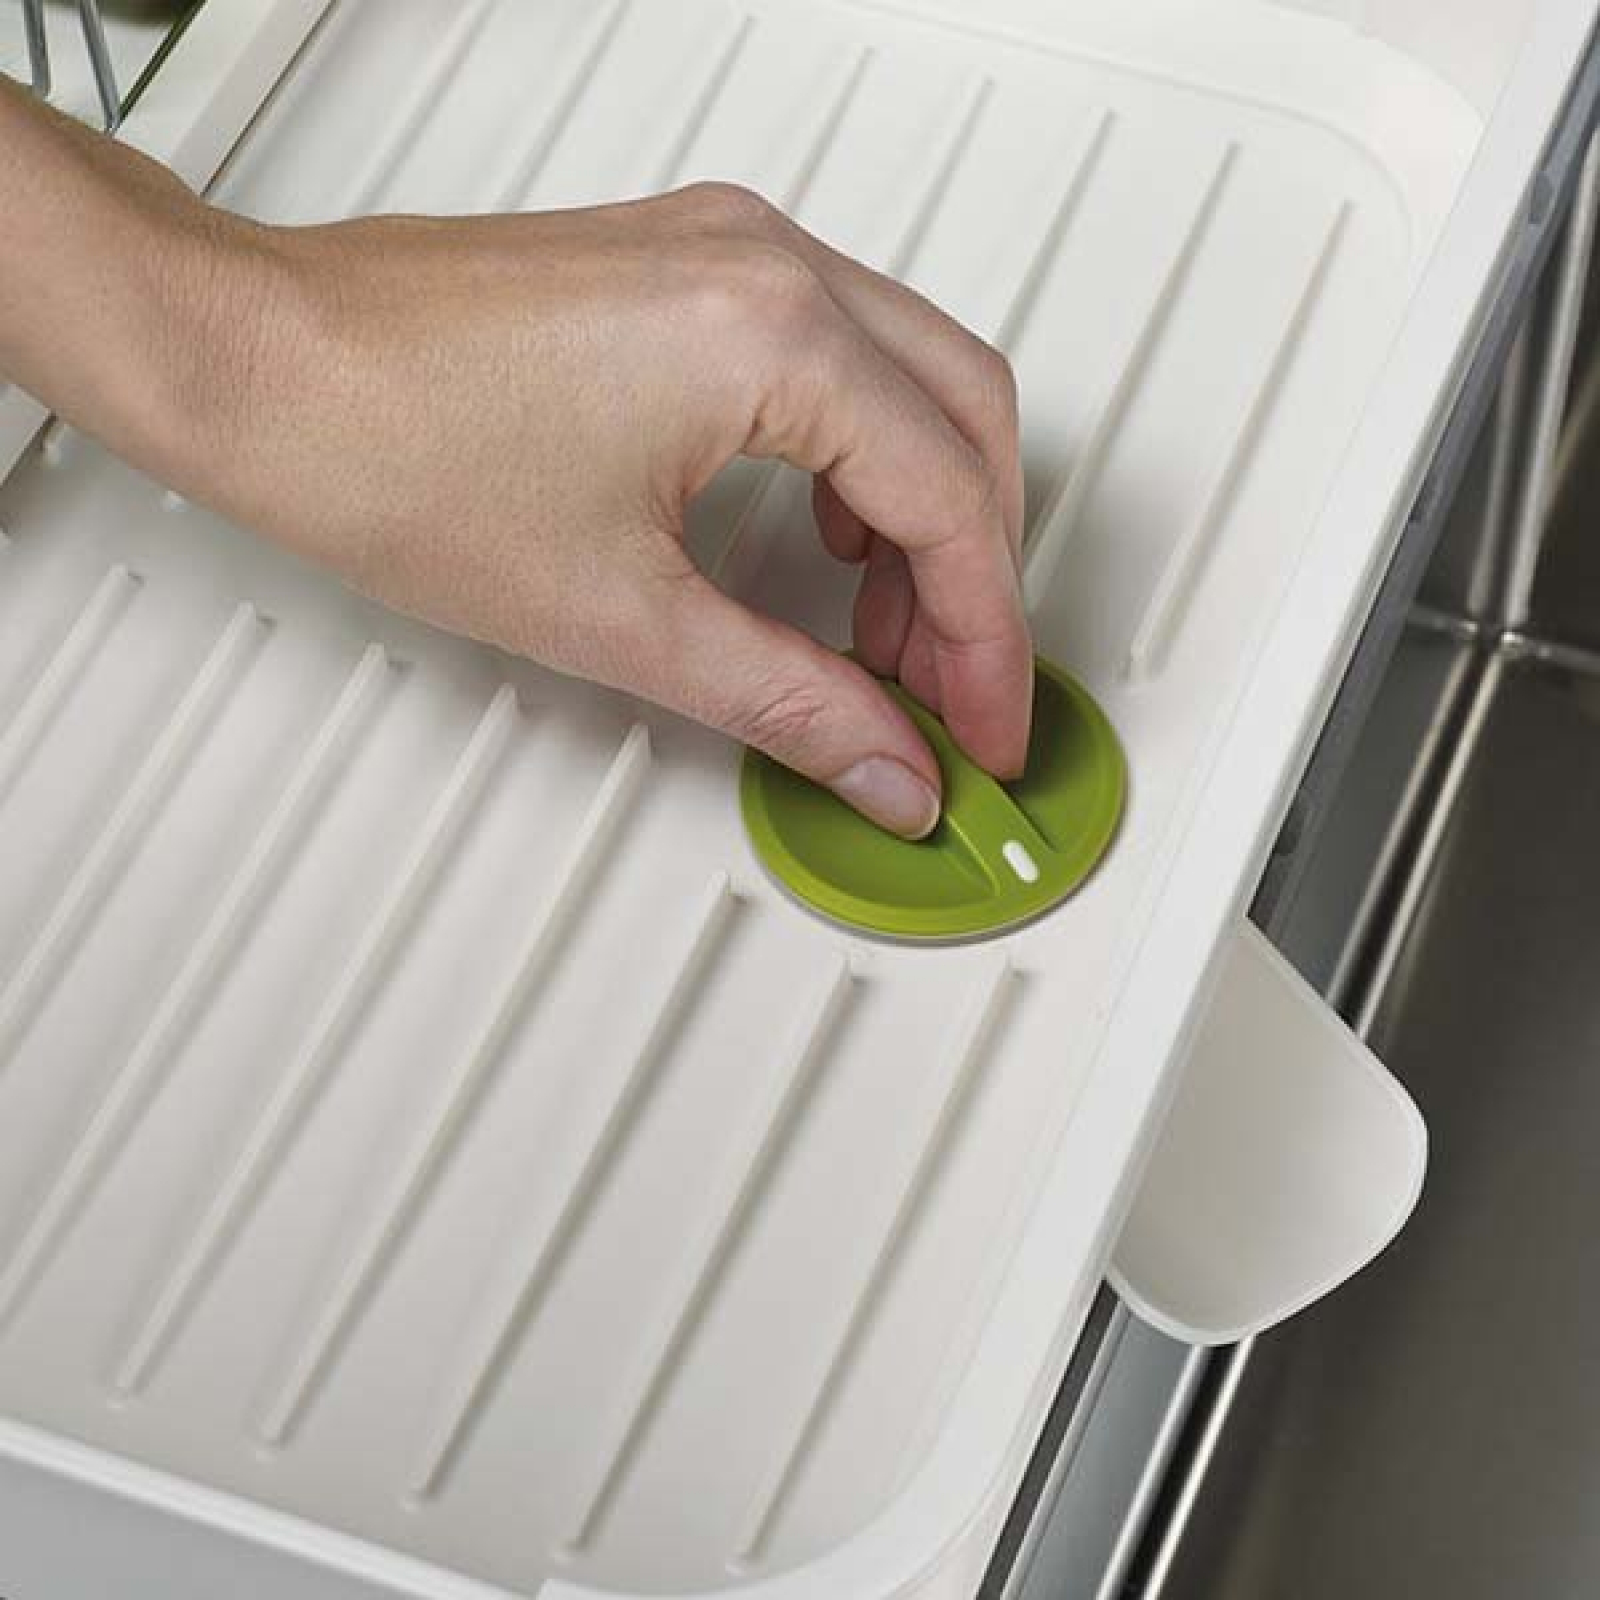 Сушилка для посуды раздвижная Joseph Joseph extend, 32х16х36 см, белый Joseph Joseph 85071 фото 5